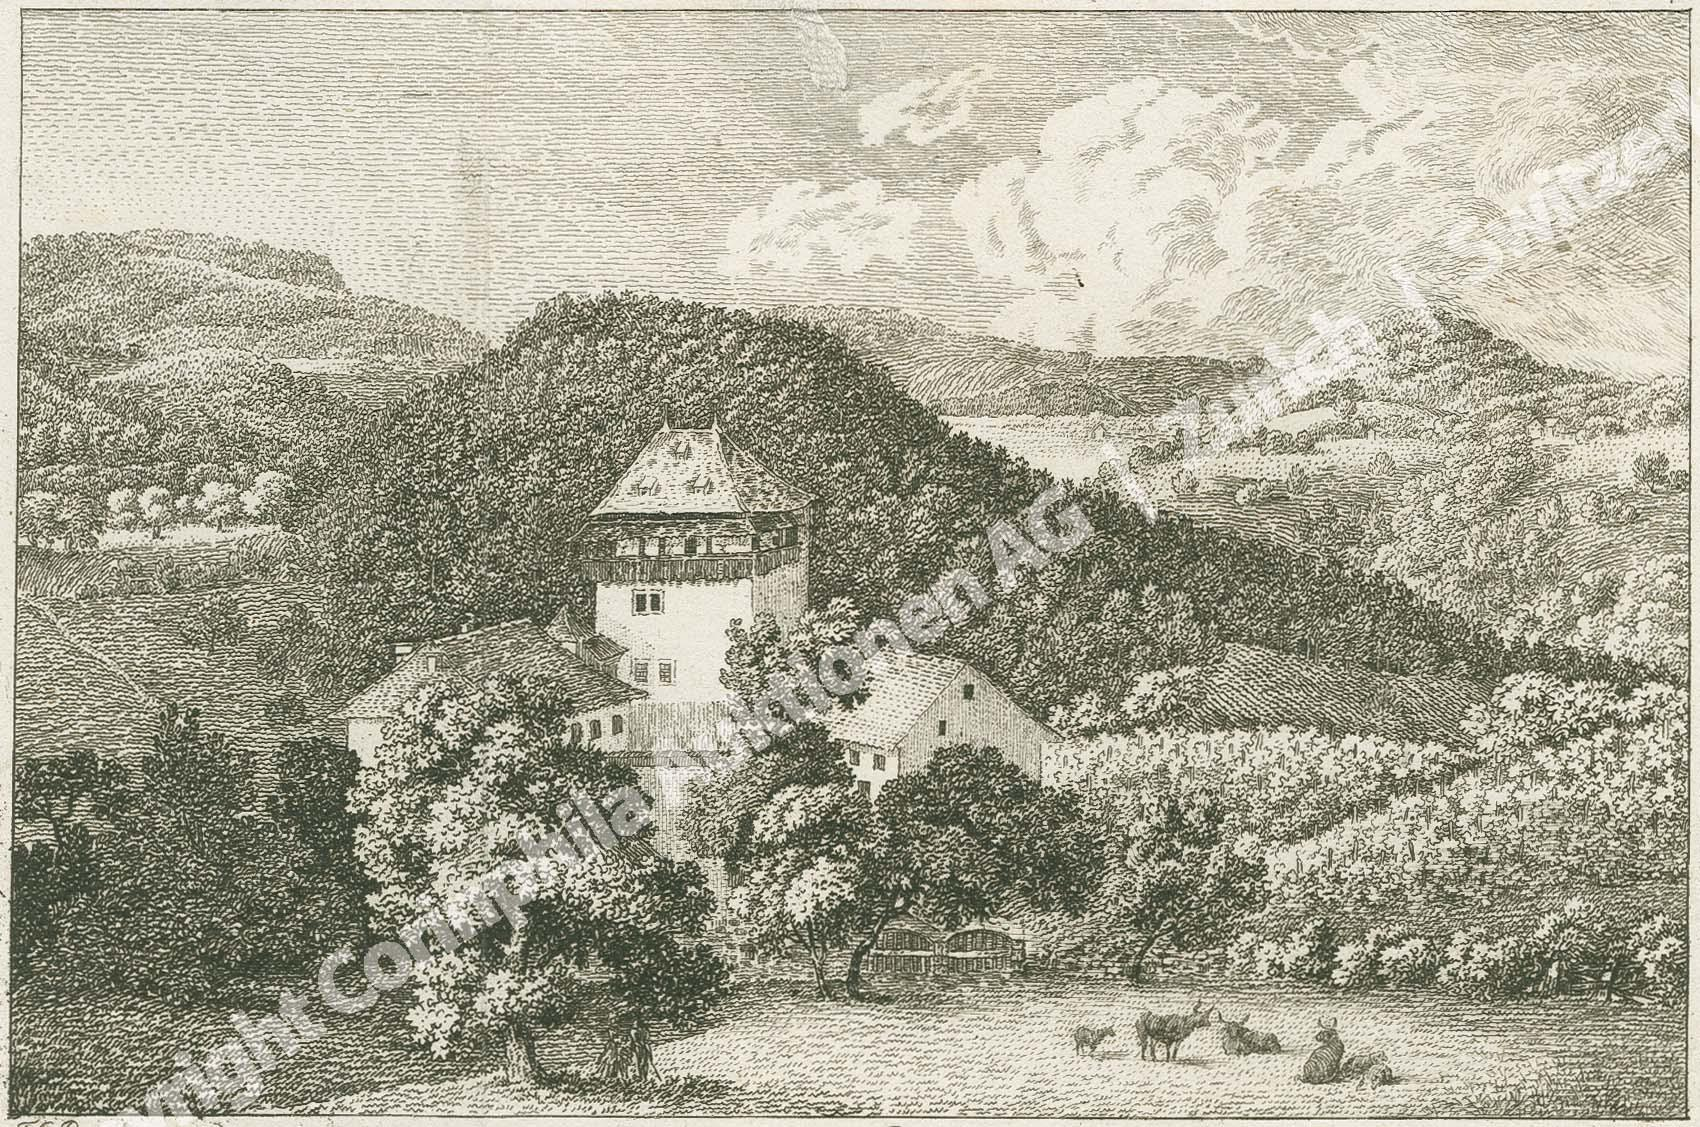 Bubendorf